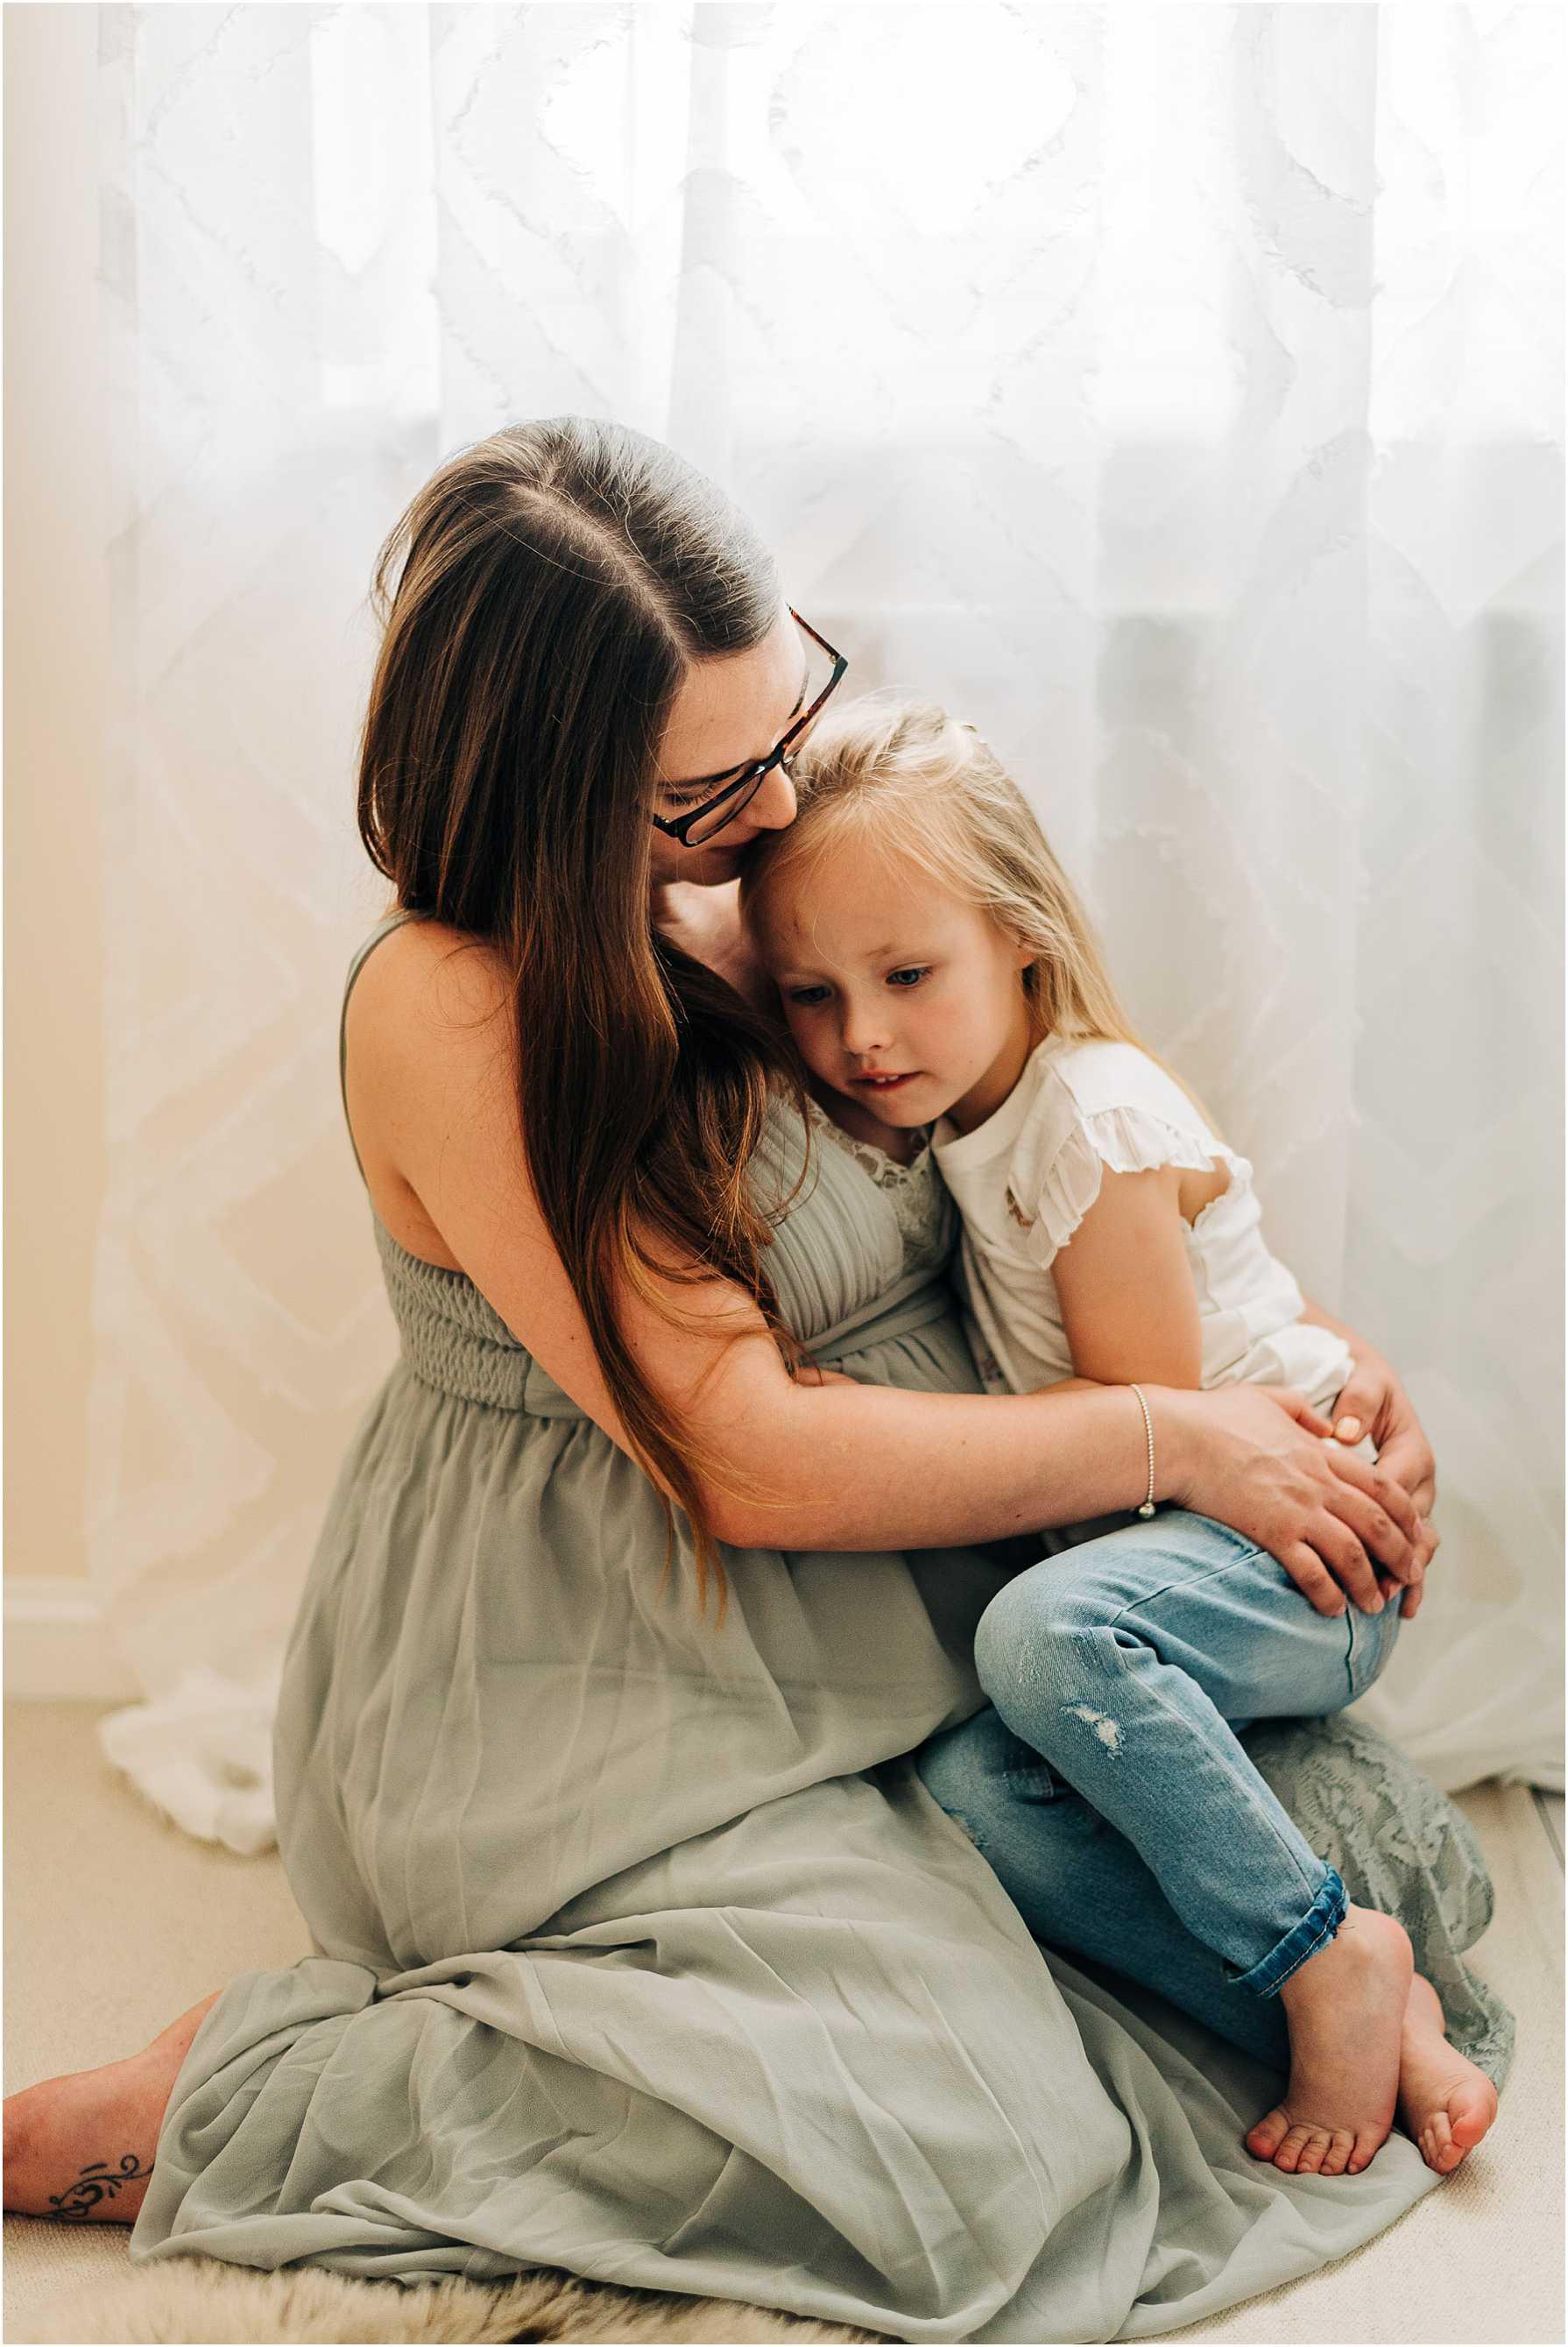 little girl cuddling her mum during a maternity photo shoot